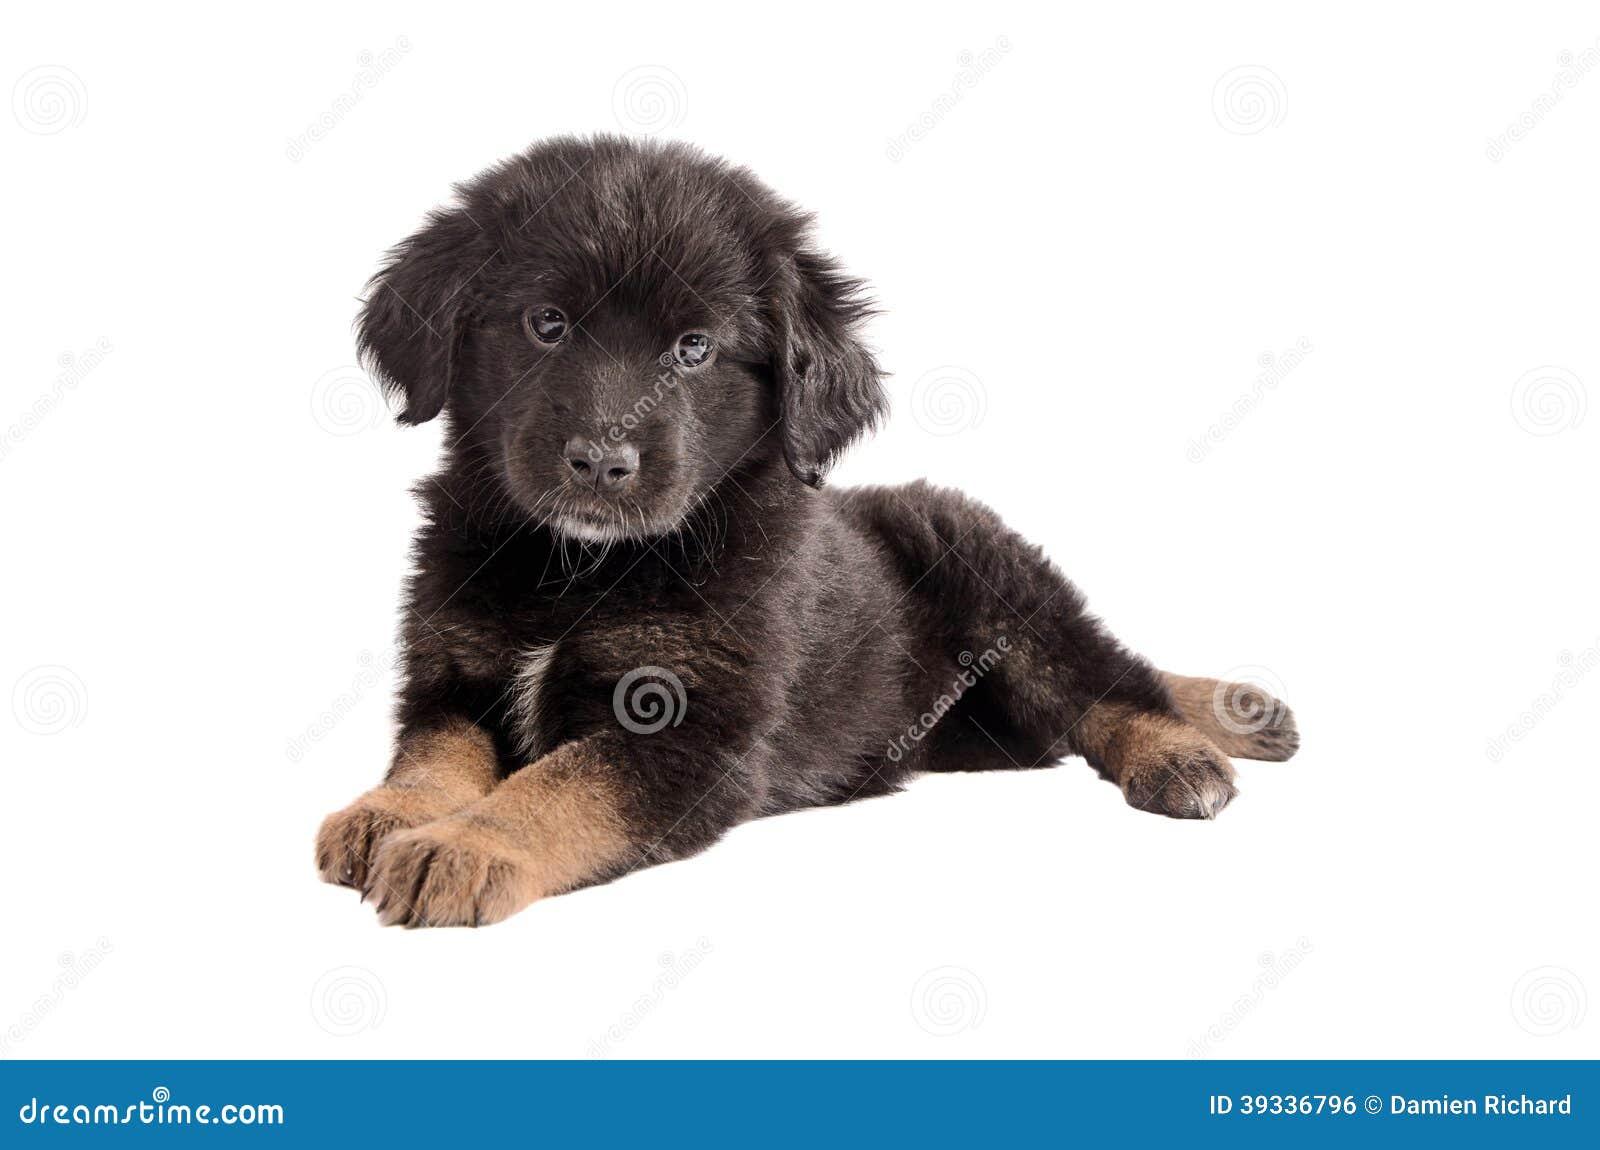 Pin Brown Fluffy Dog on Pinterest